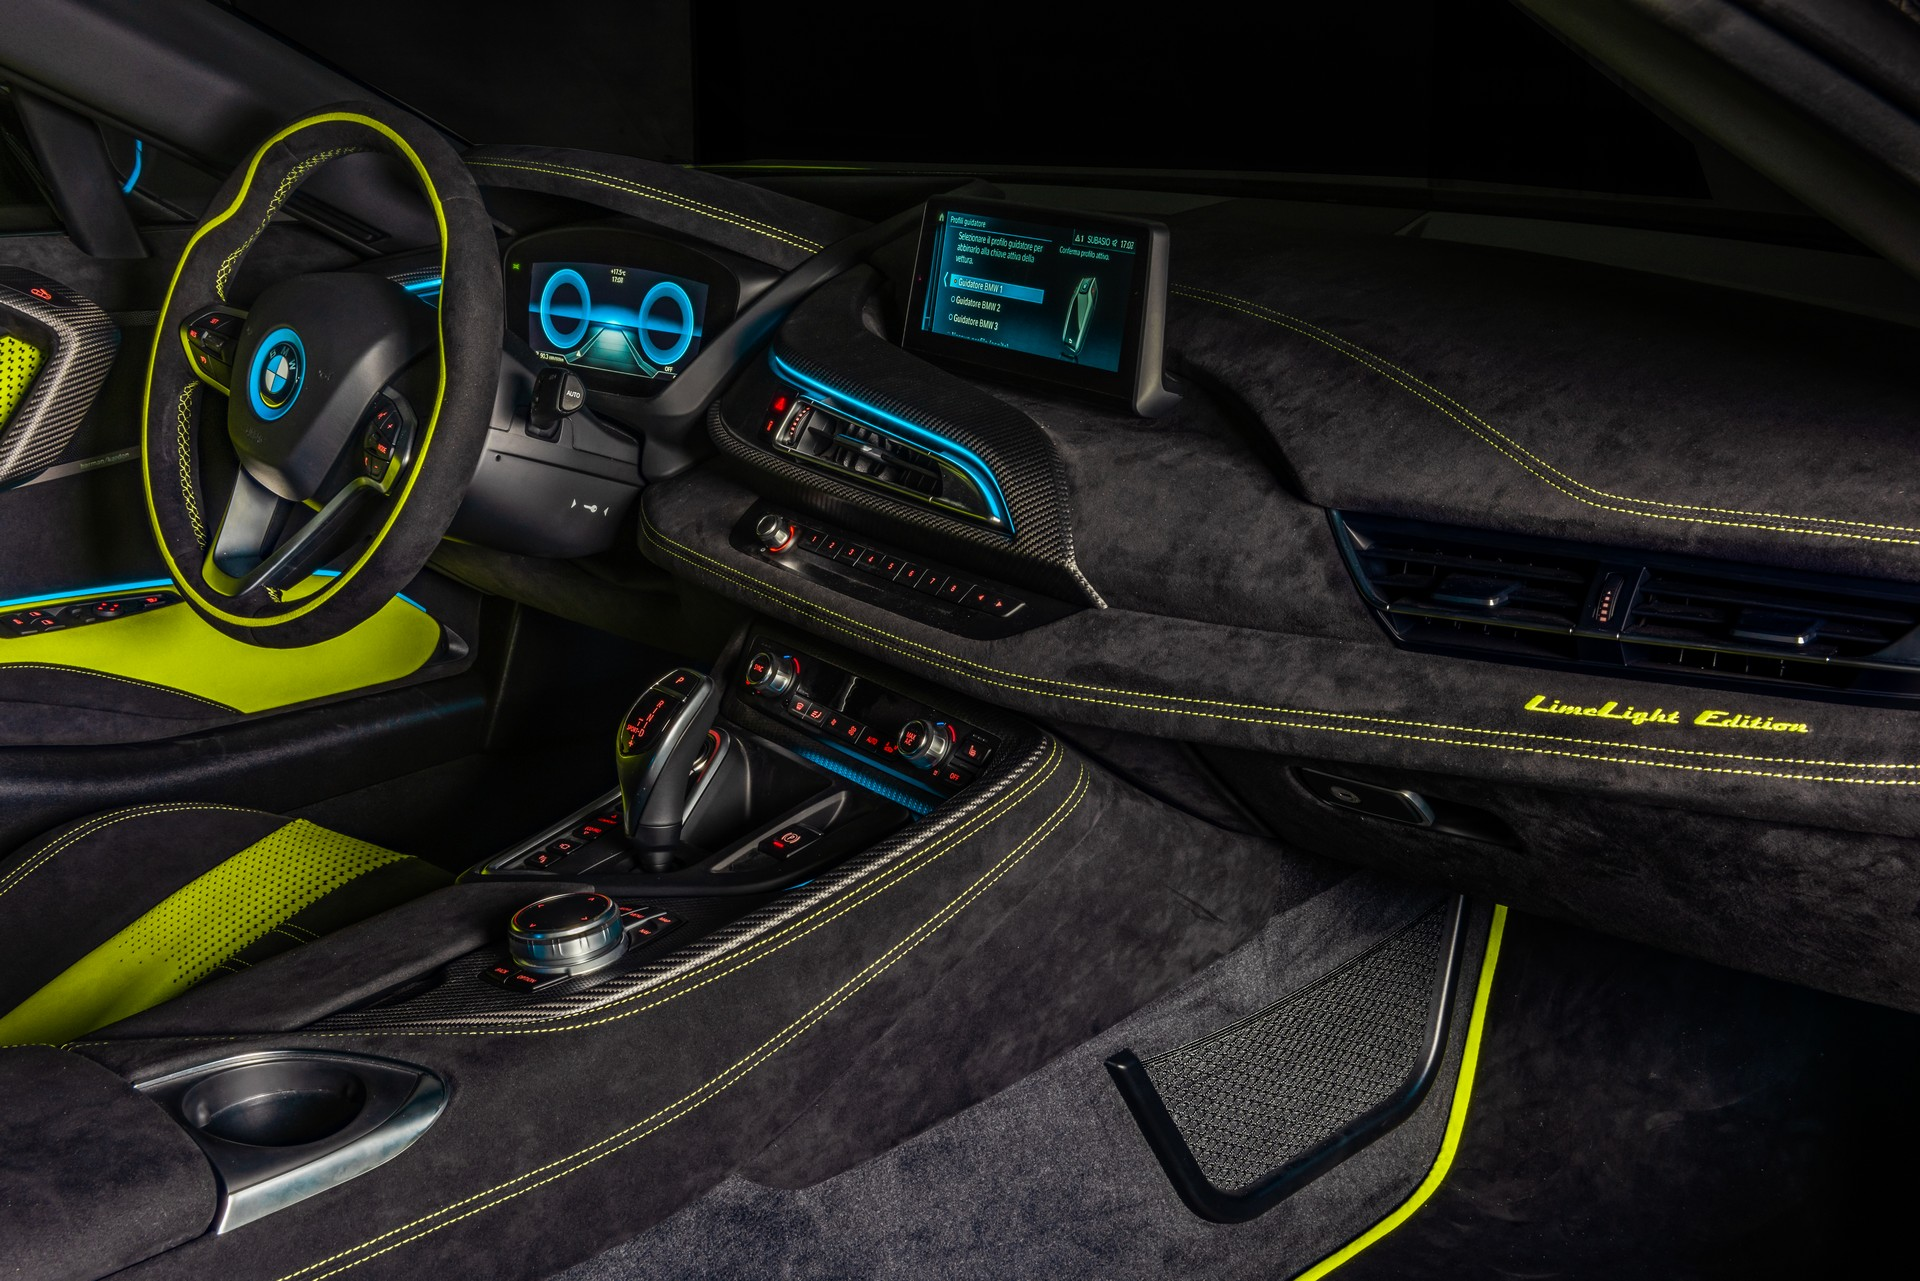 BMW I8 Custom >> Bmw I8 Roadster Limelight Edition Stunning Custom Work